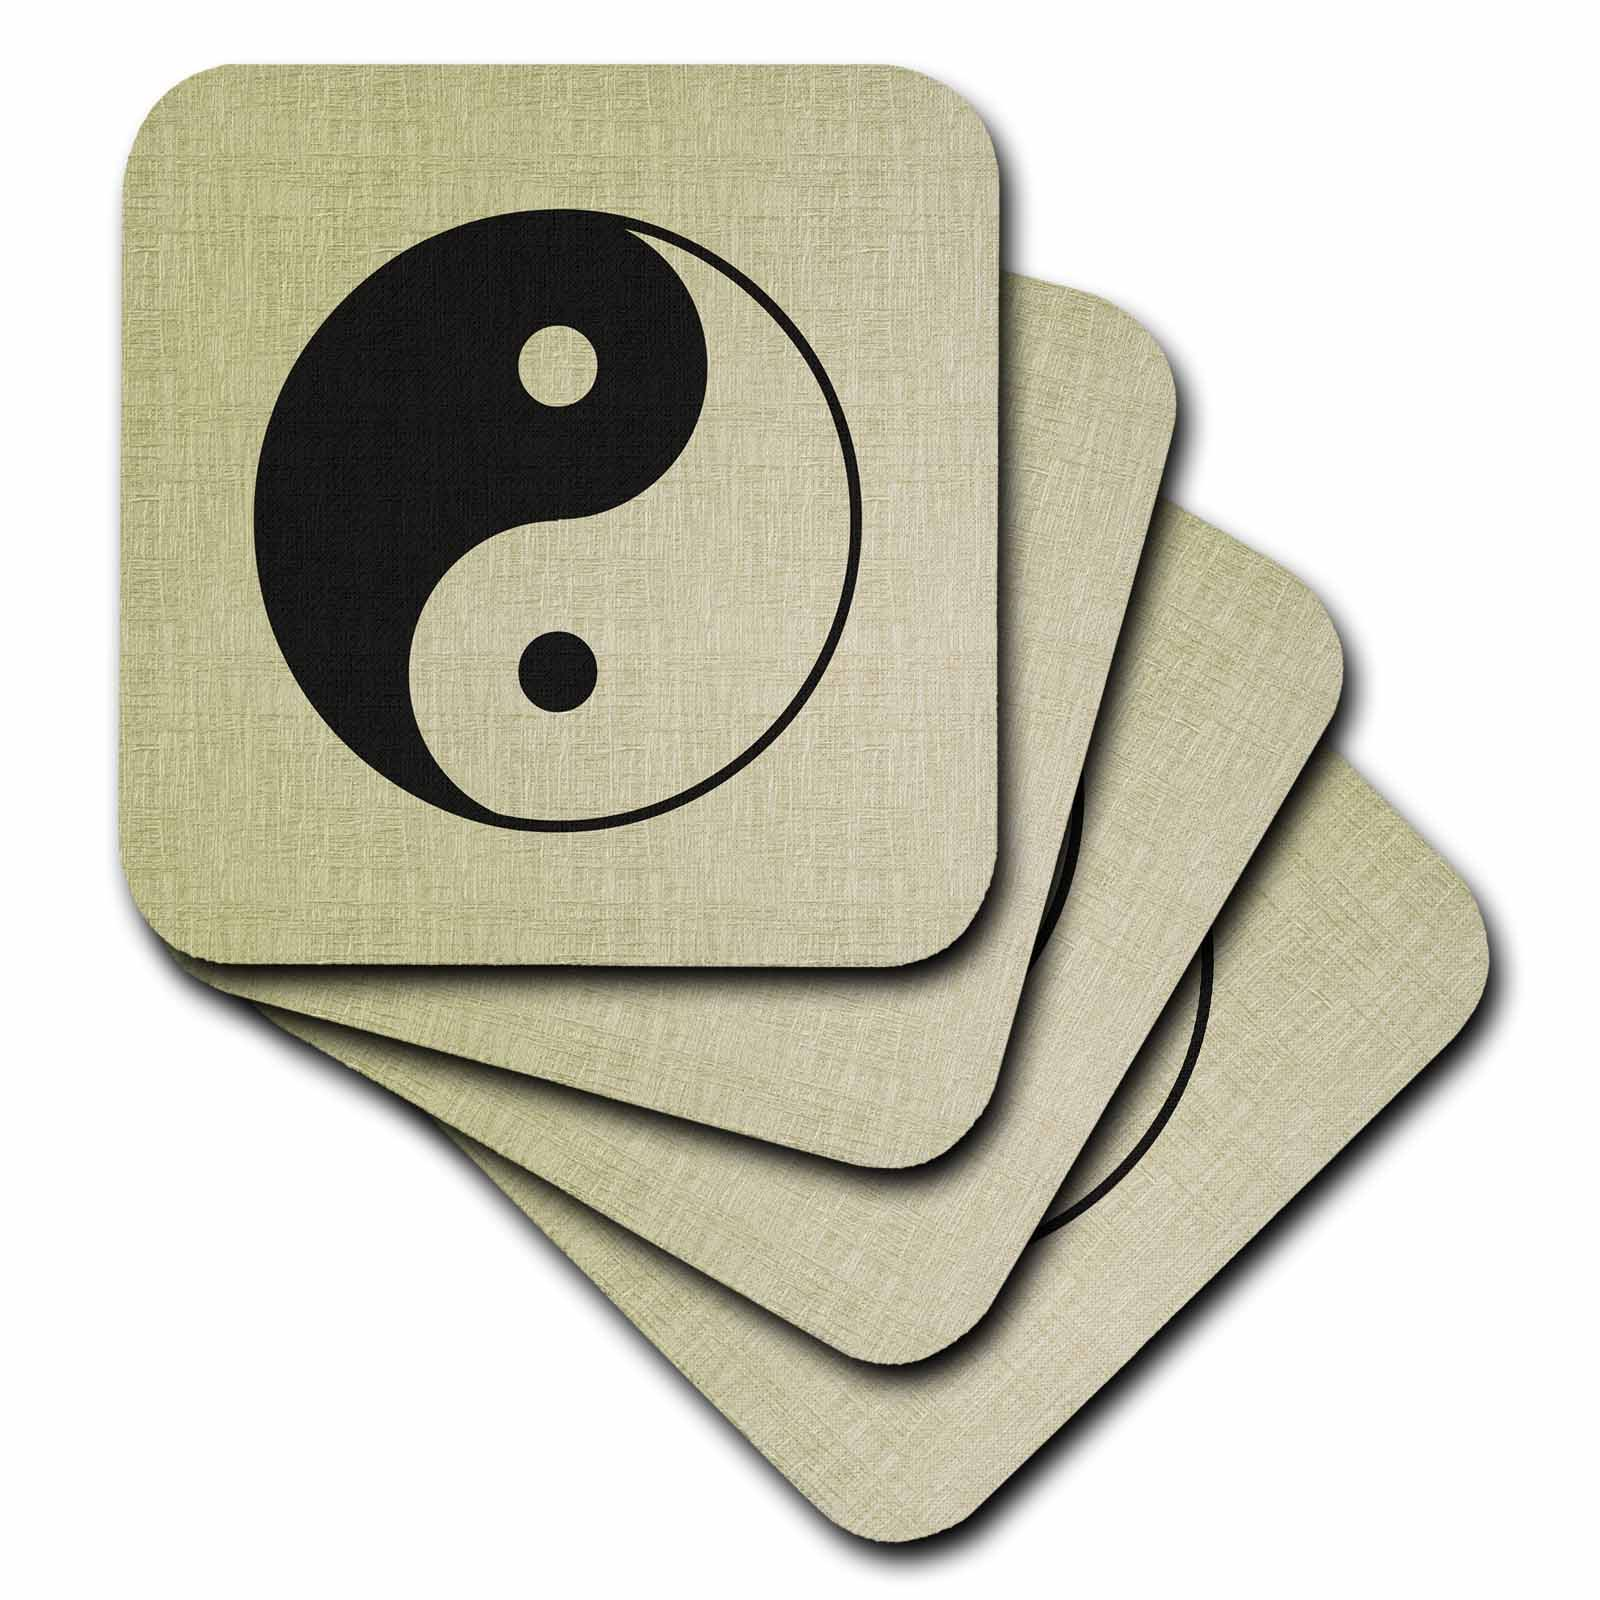 3dRose cst/_162273/_1 Textured Zen Yin Yang-Spirituality-Soft Coasters Set of 4